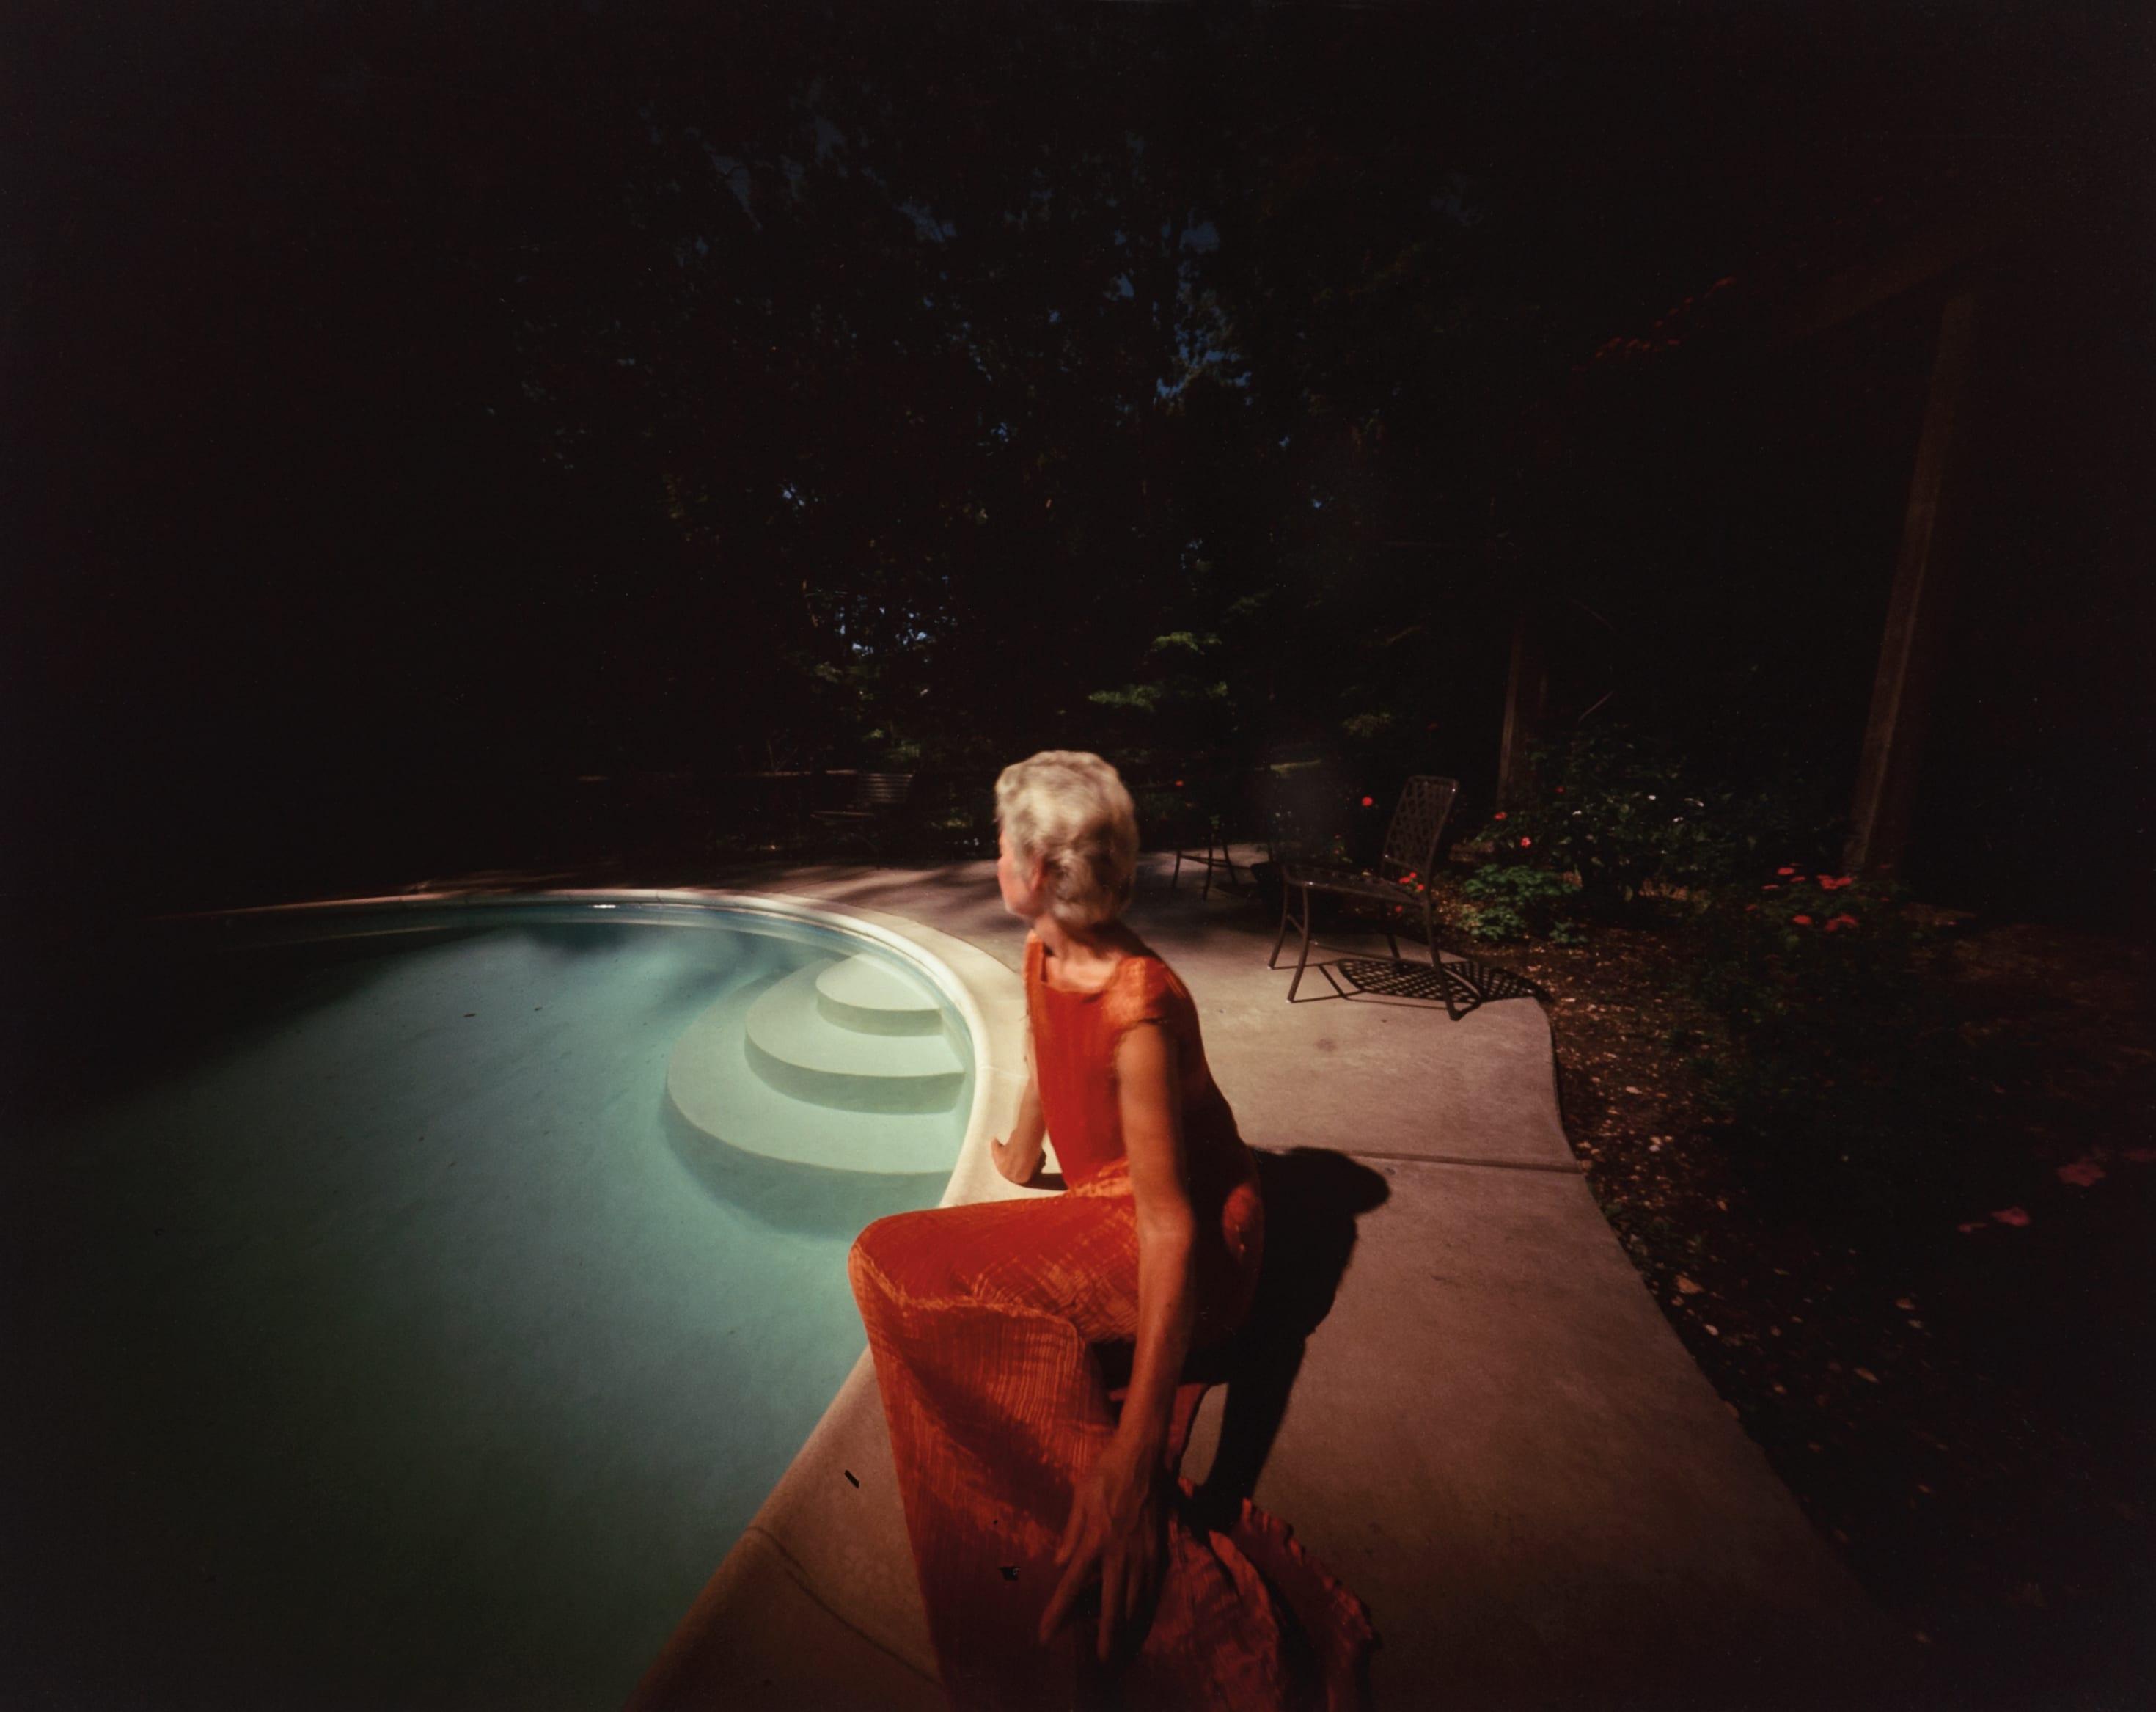 Richmond, Virginia: Joan by Her Pool, 1986